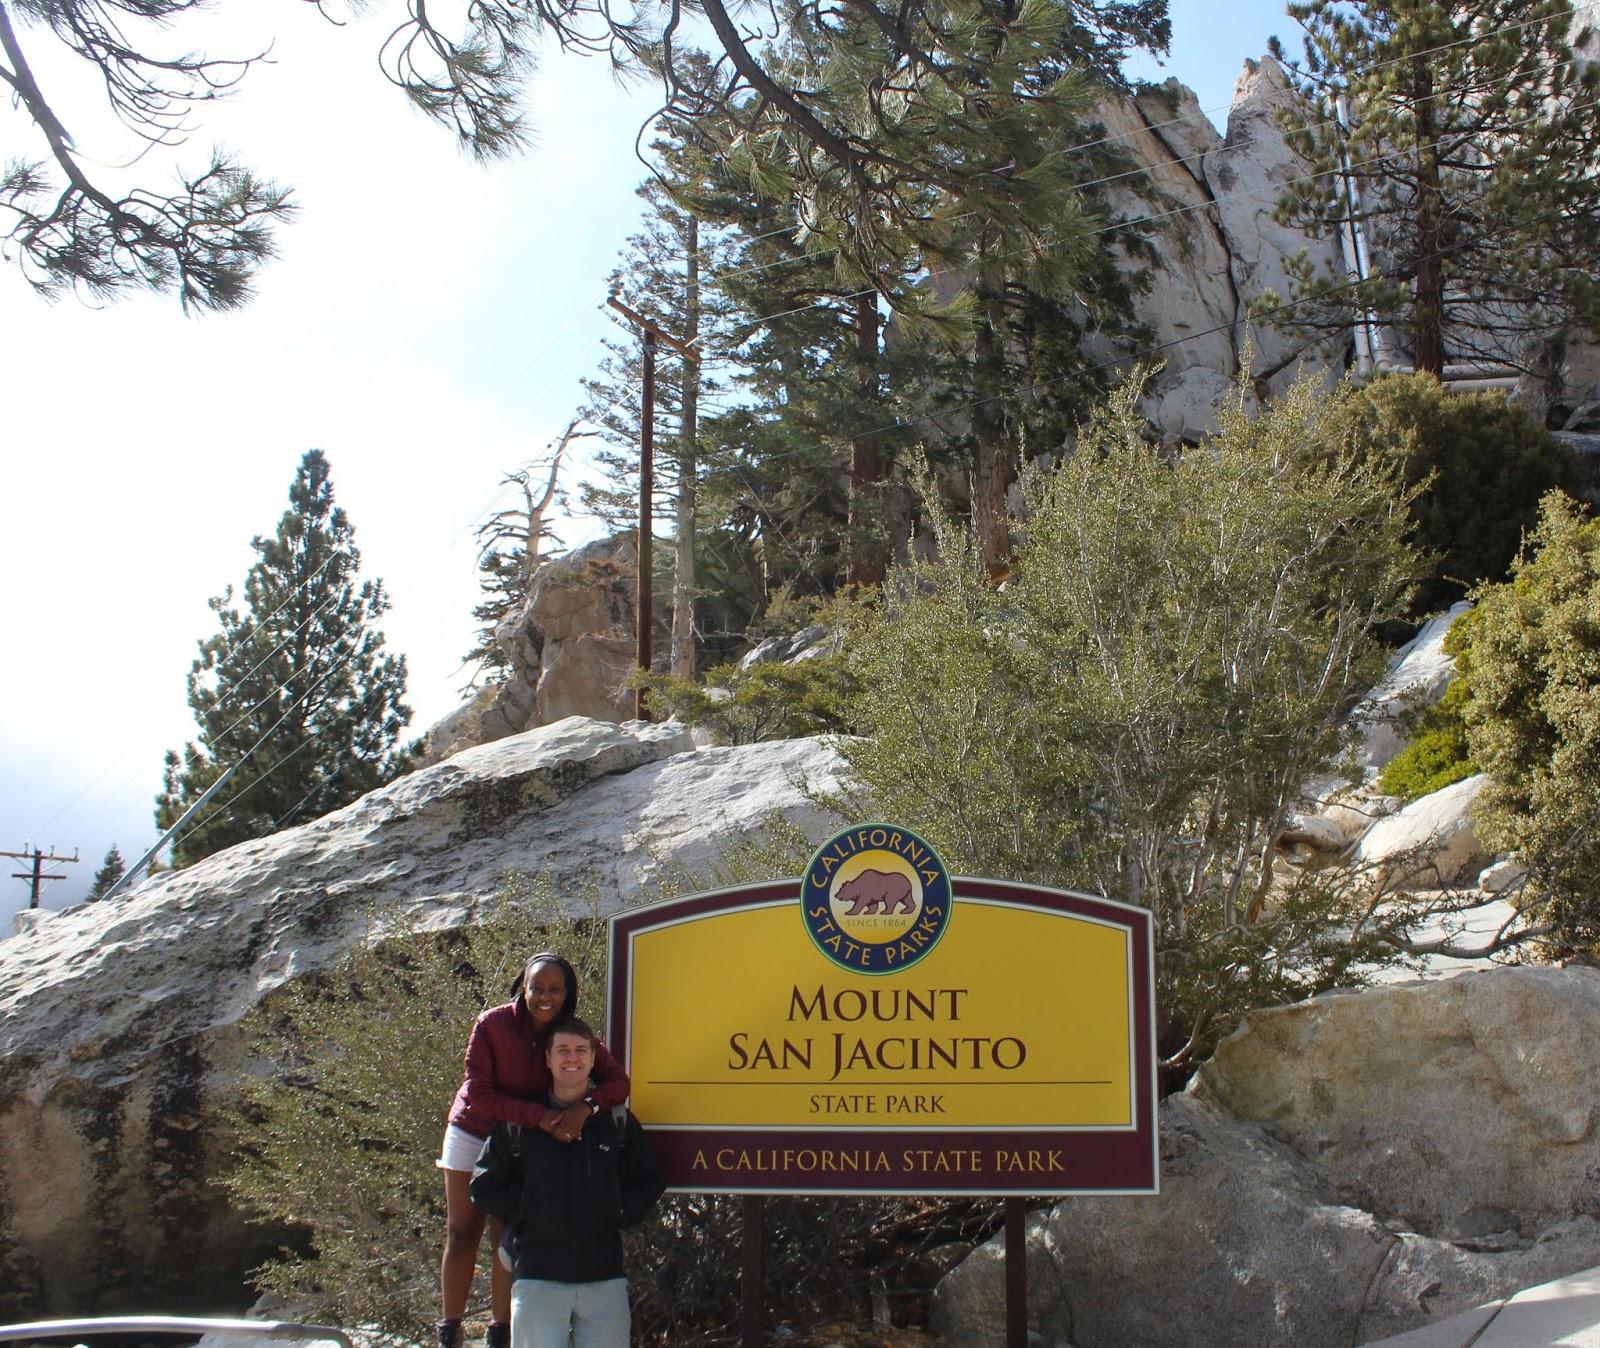 mount san jacinto makignrestorationsblog 4